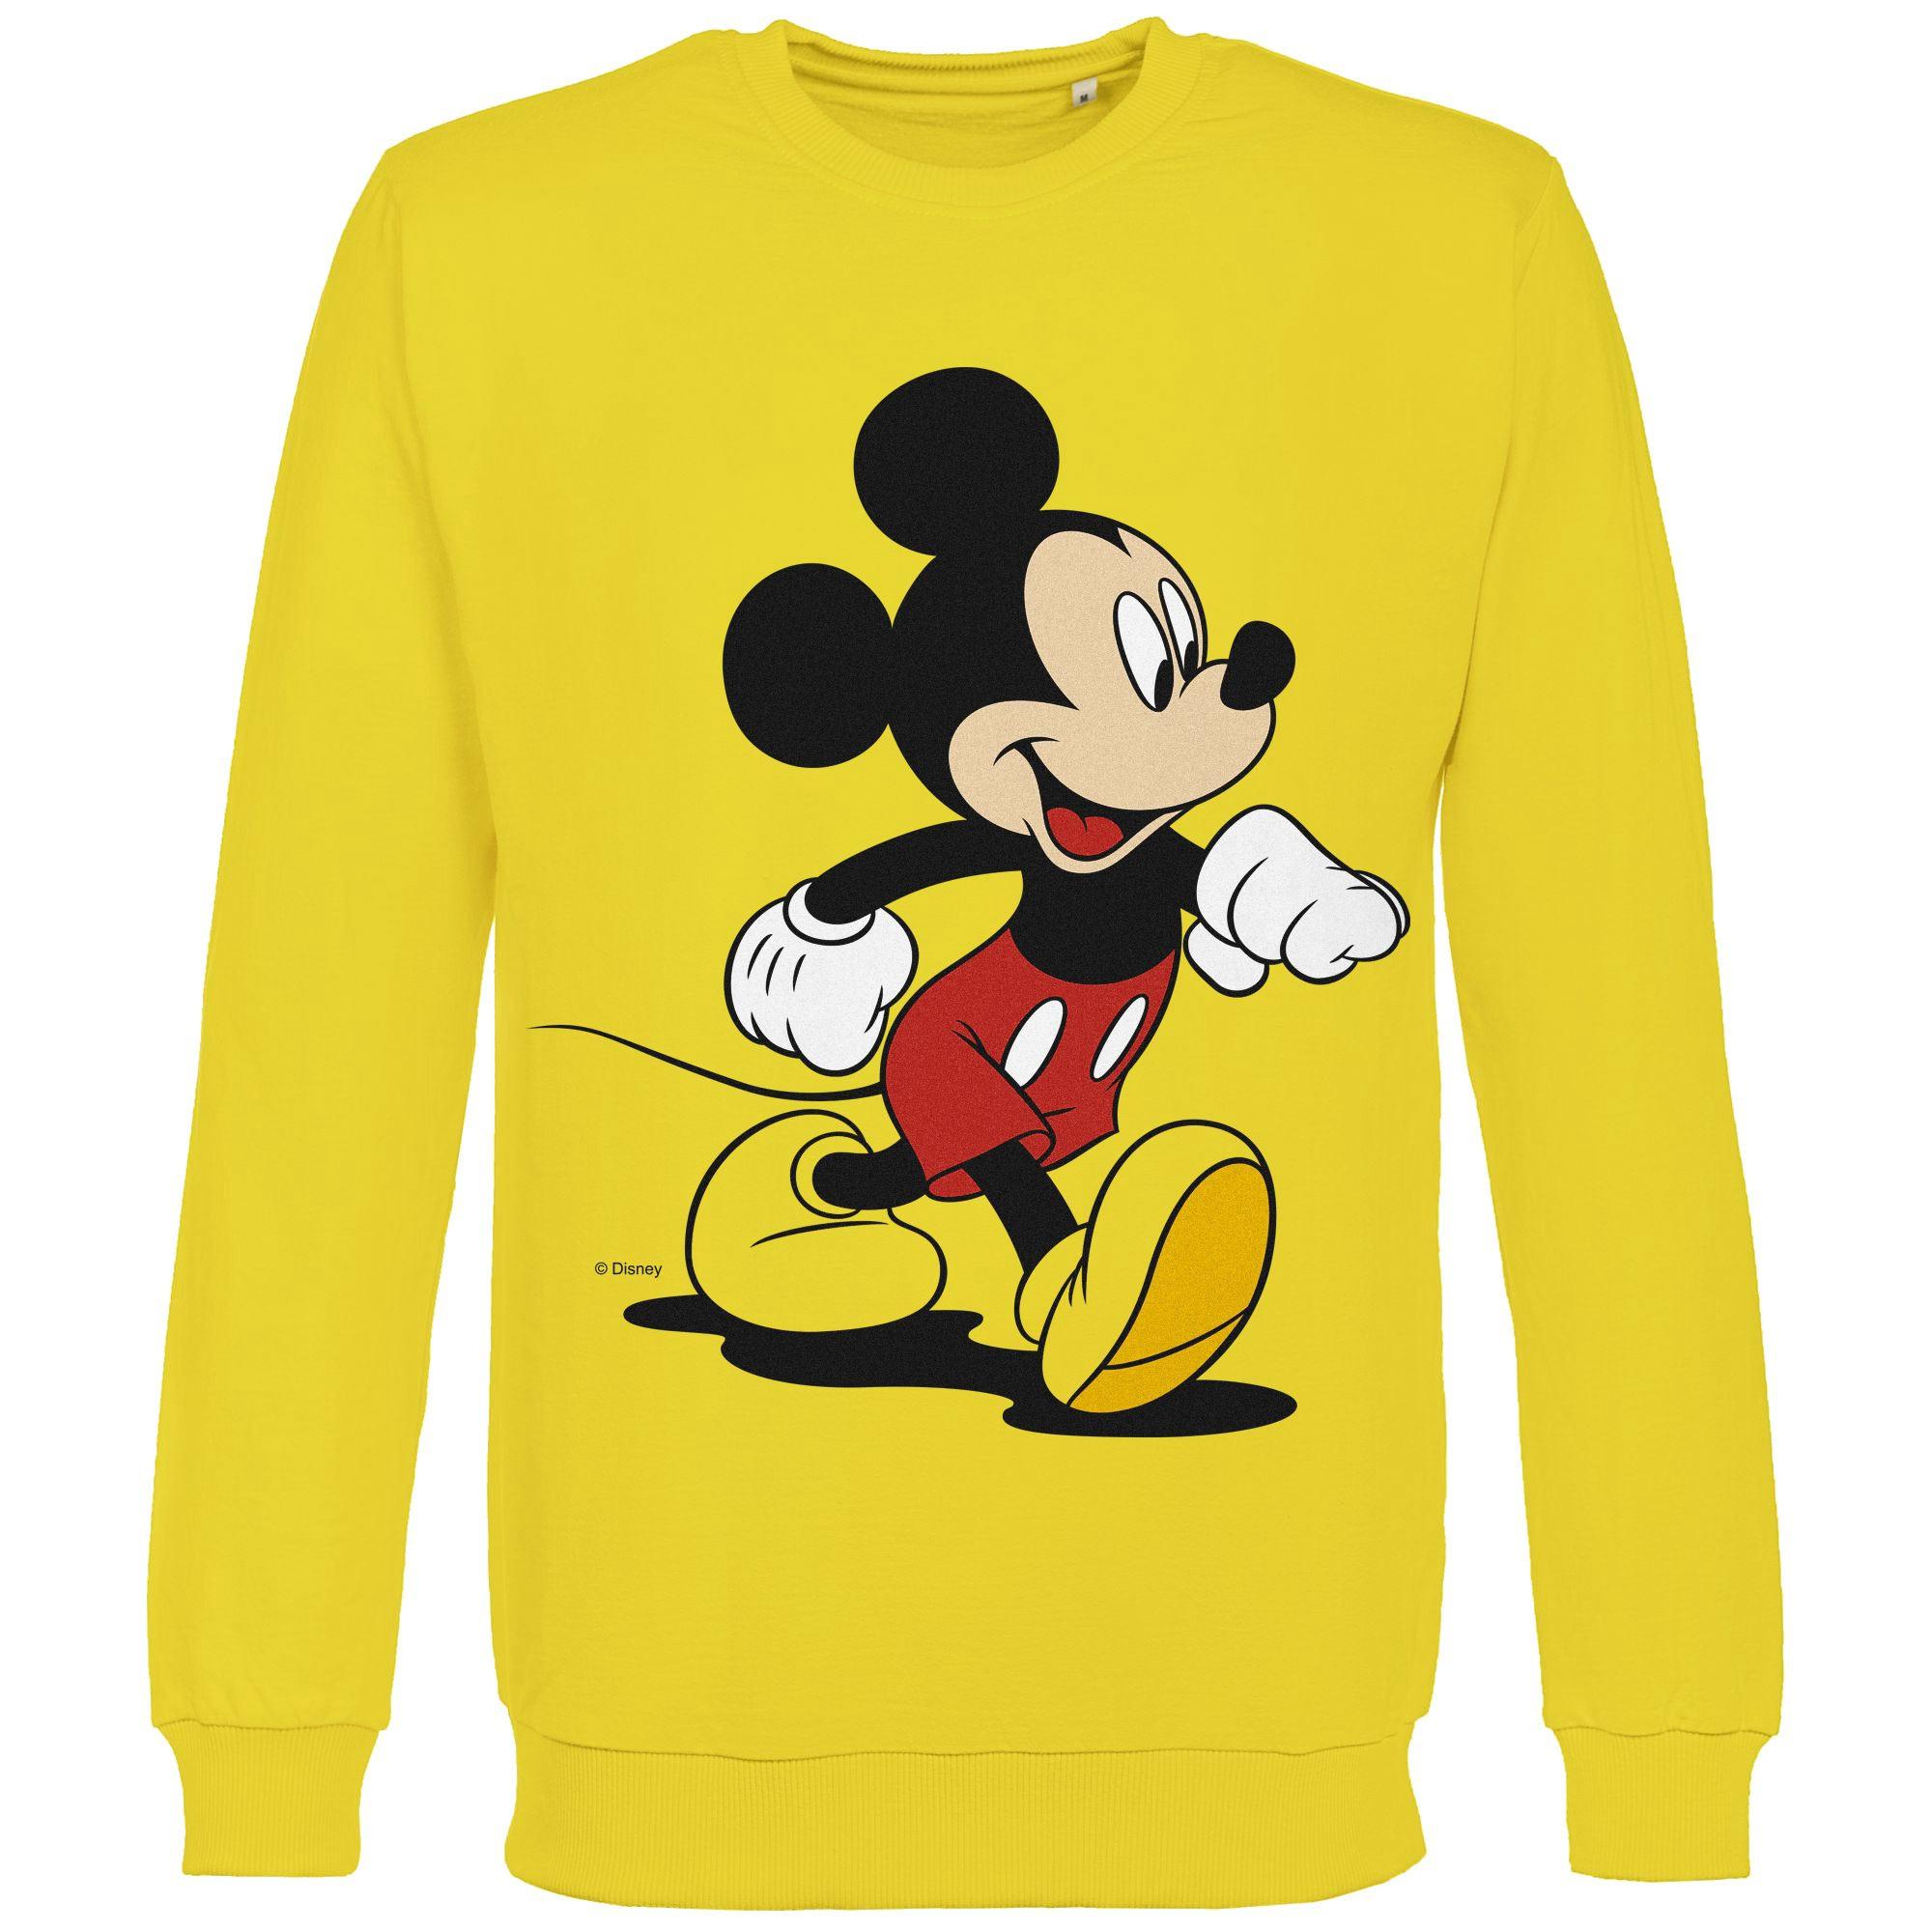 Толстовка «Микки Маус. Easygoing», желтая арт 44405.80